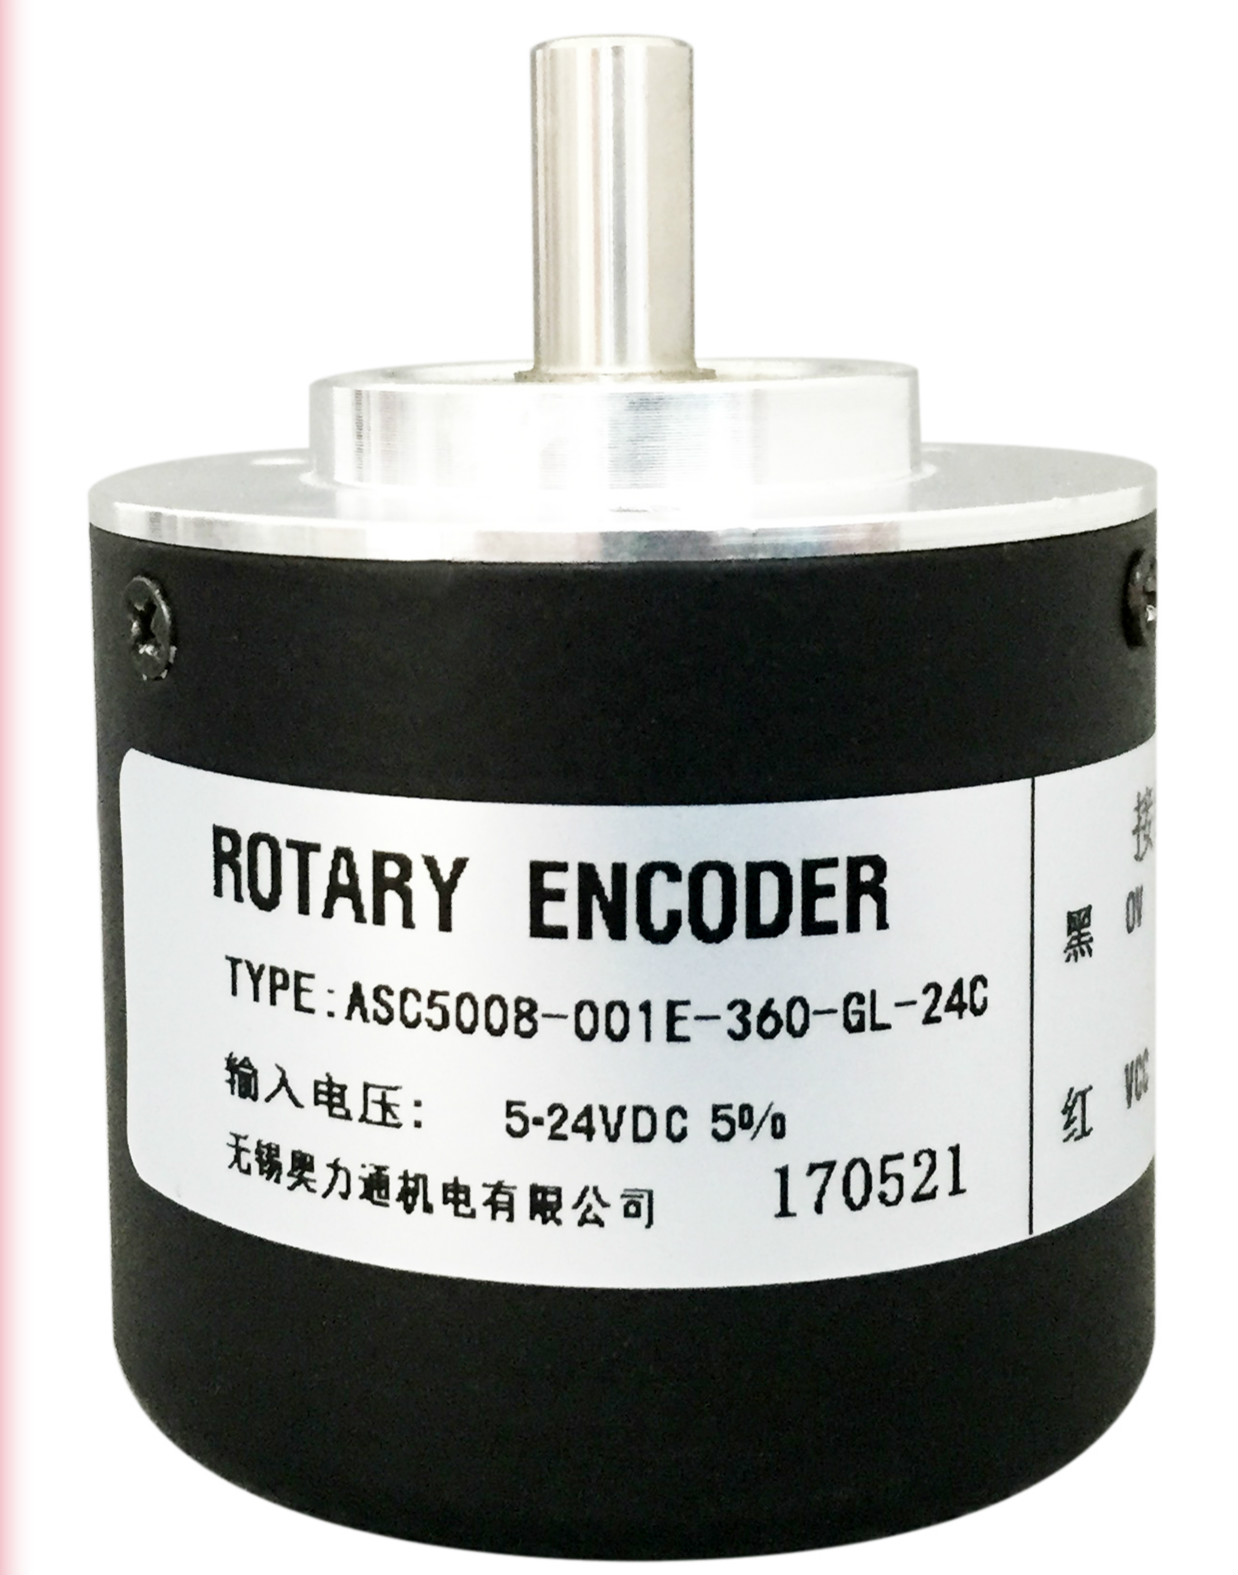 ASC5008-001E-360-GL-24C Photoelectric Encoder